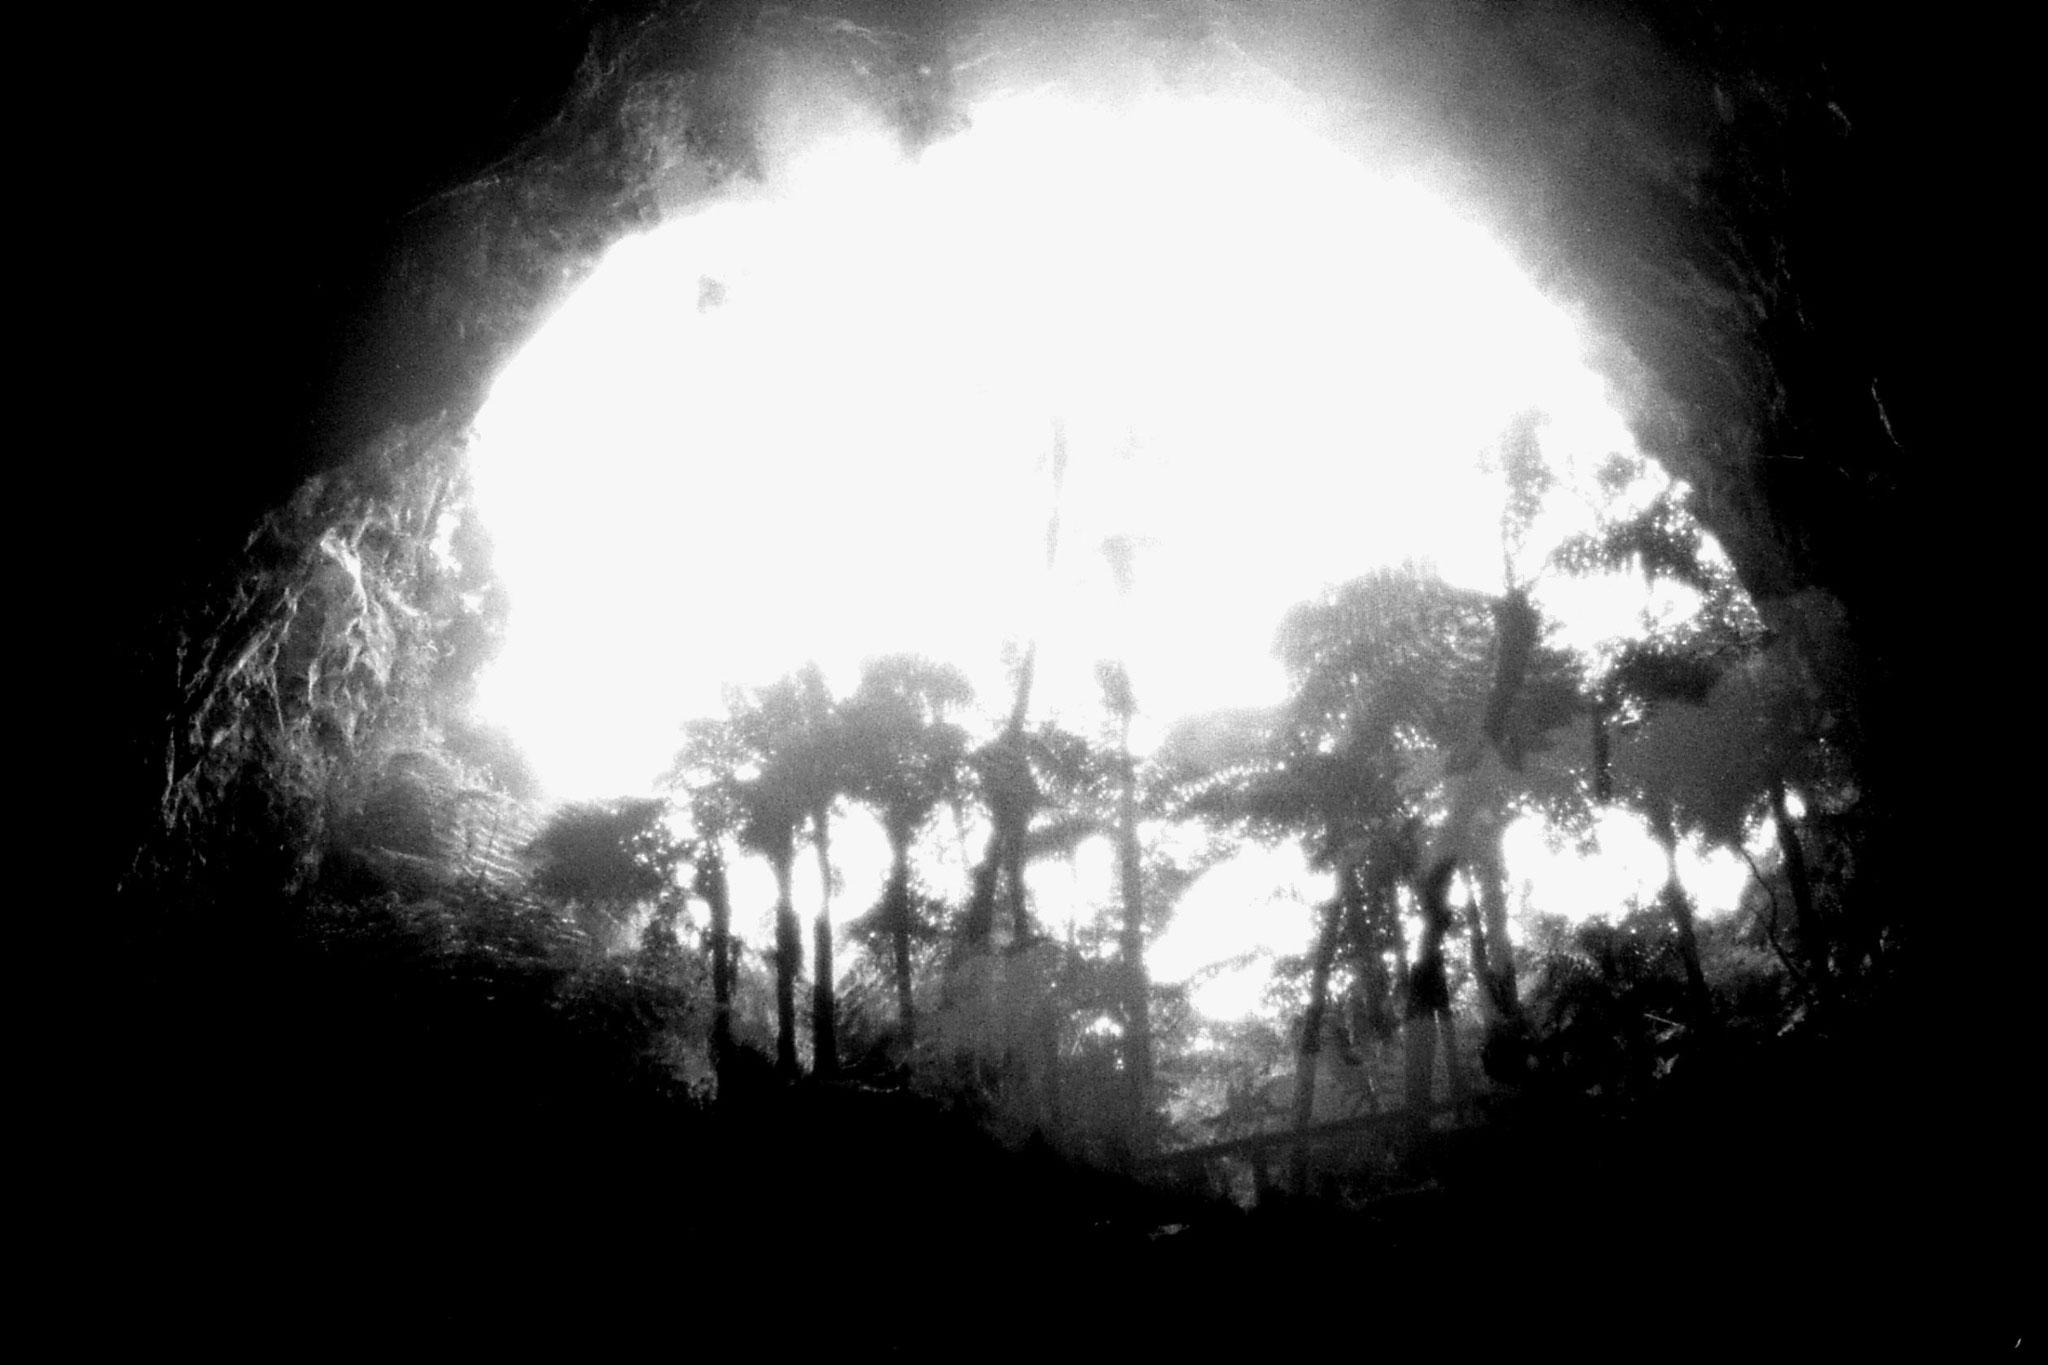 31/8/1990: 7: Orakeikorako opening of Ruatapu Cave